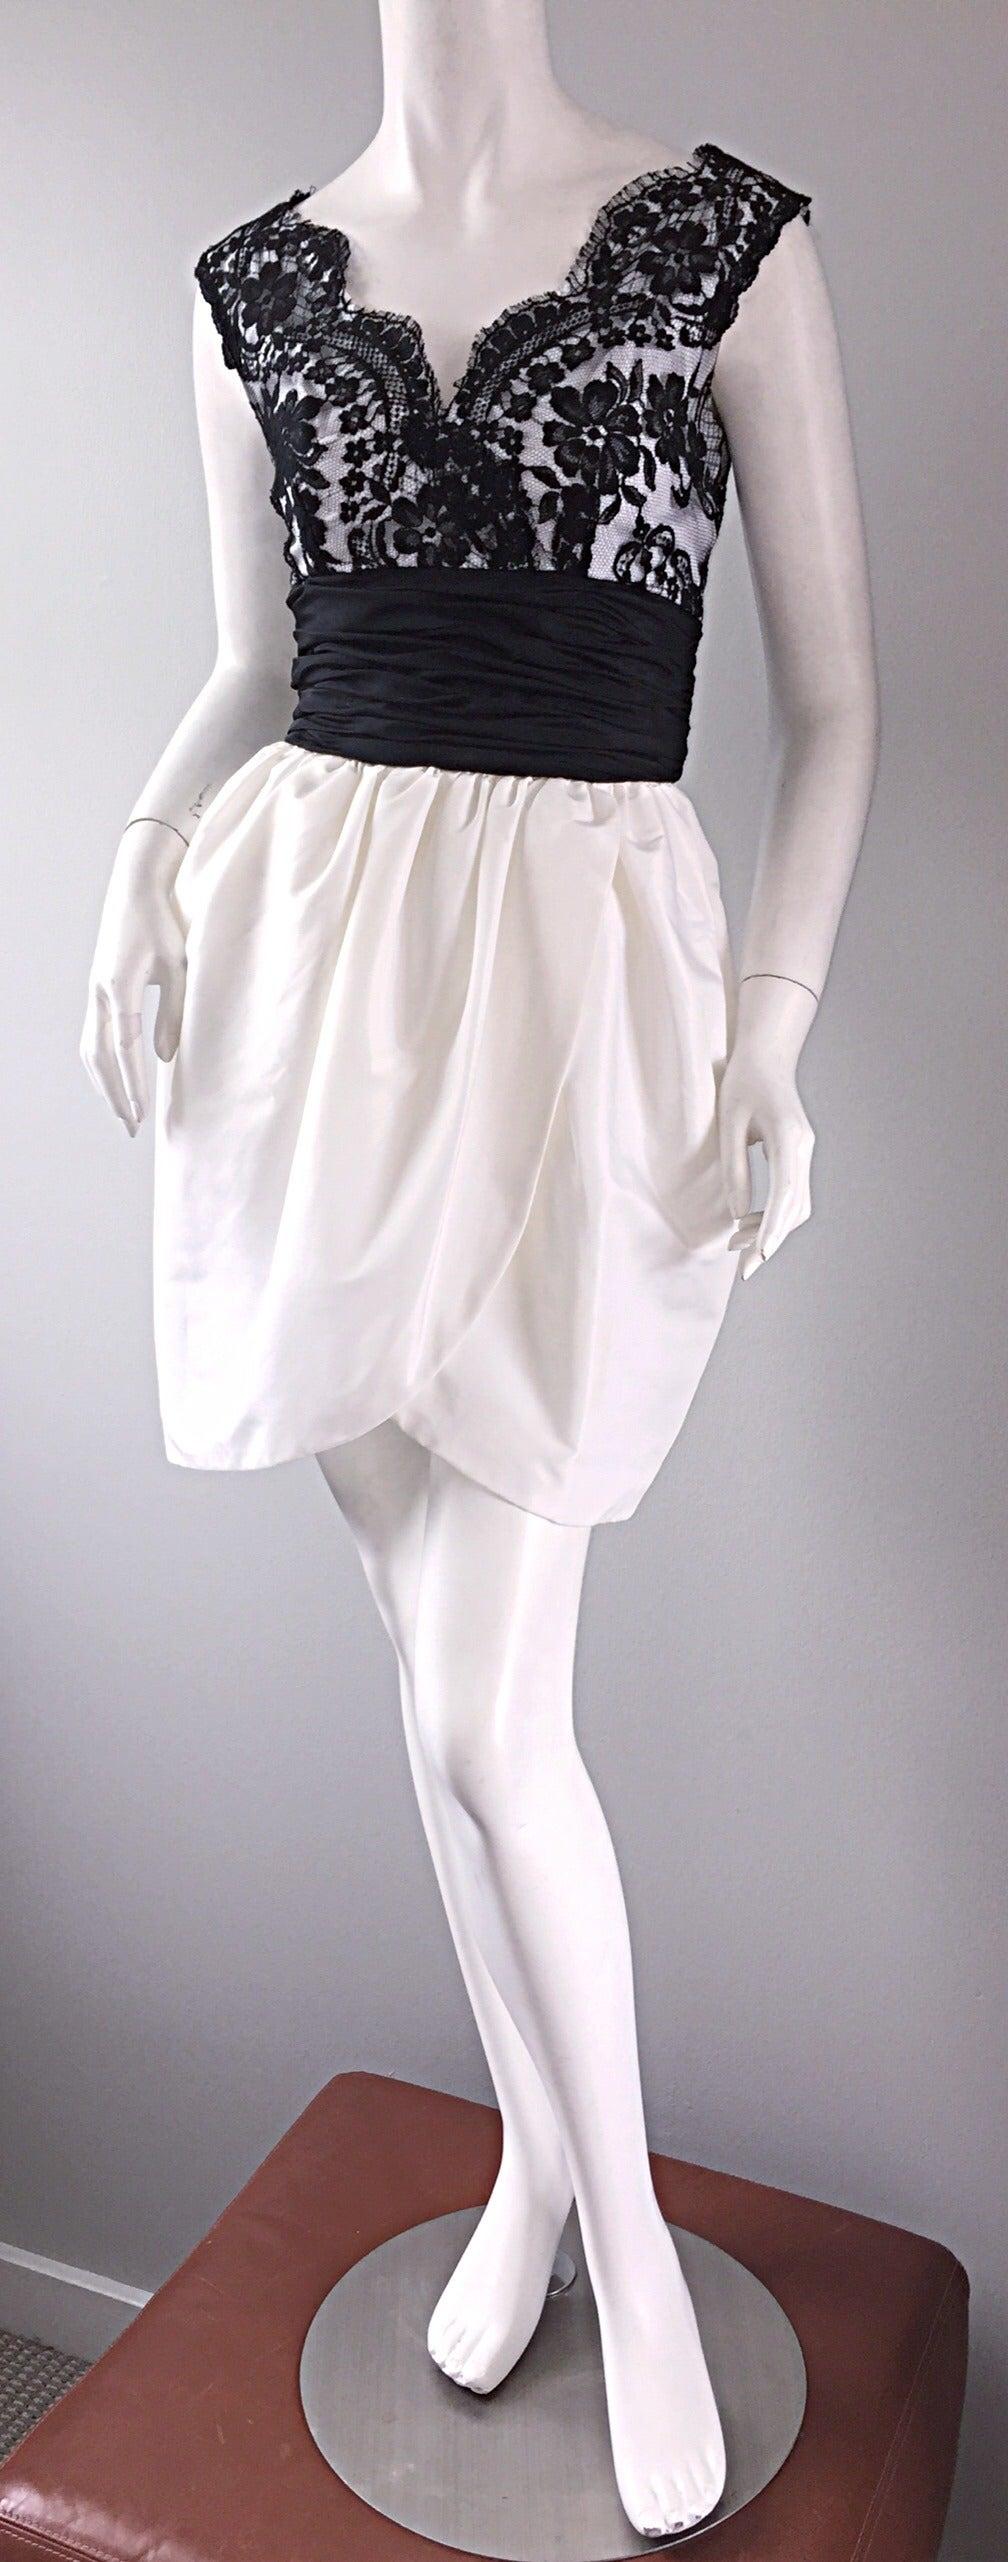 Vintage Victor Costa Black + White Silk Taffeta Lace Cocktail Dress 7